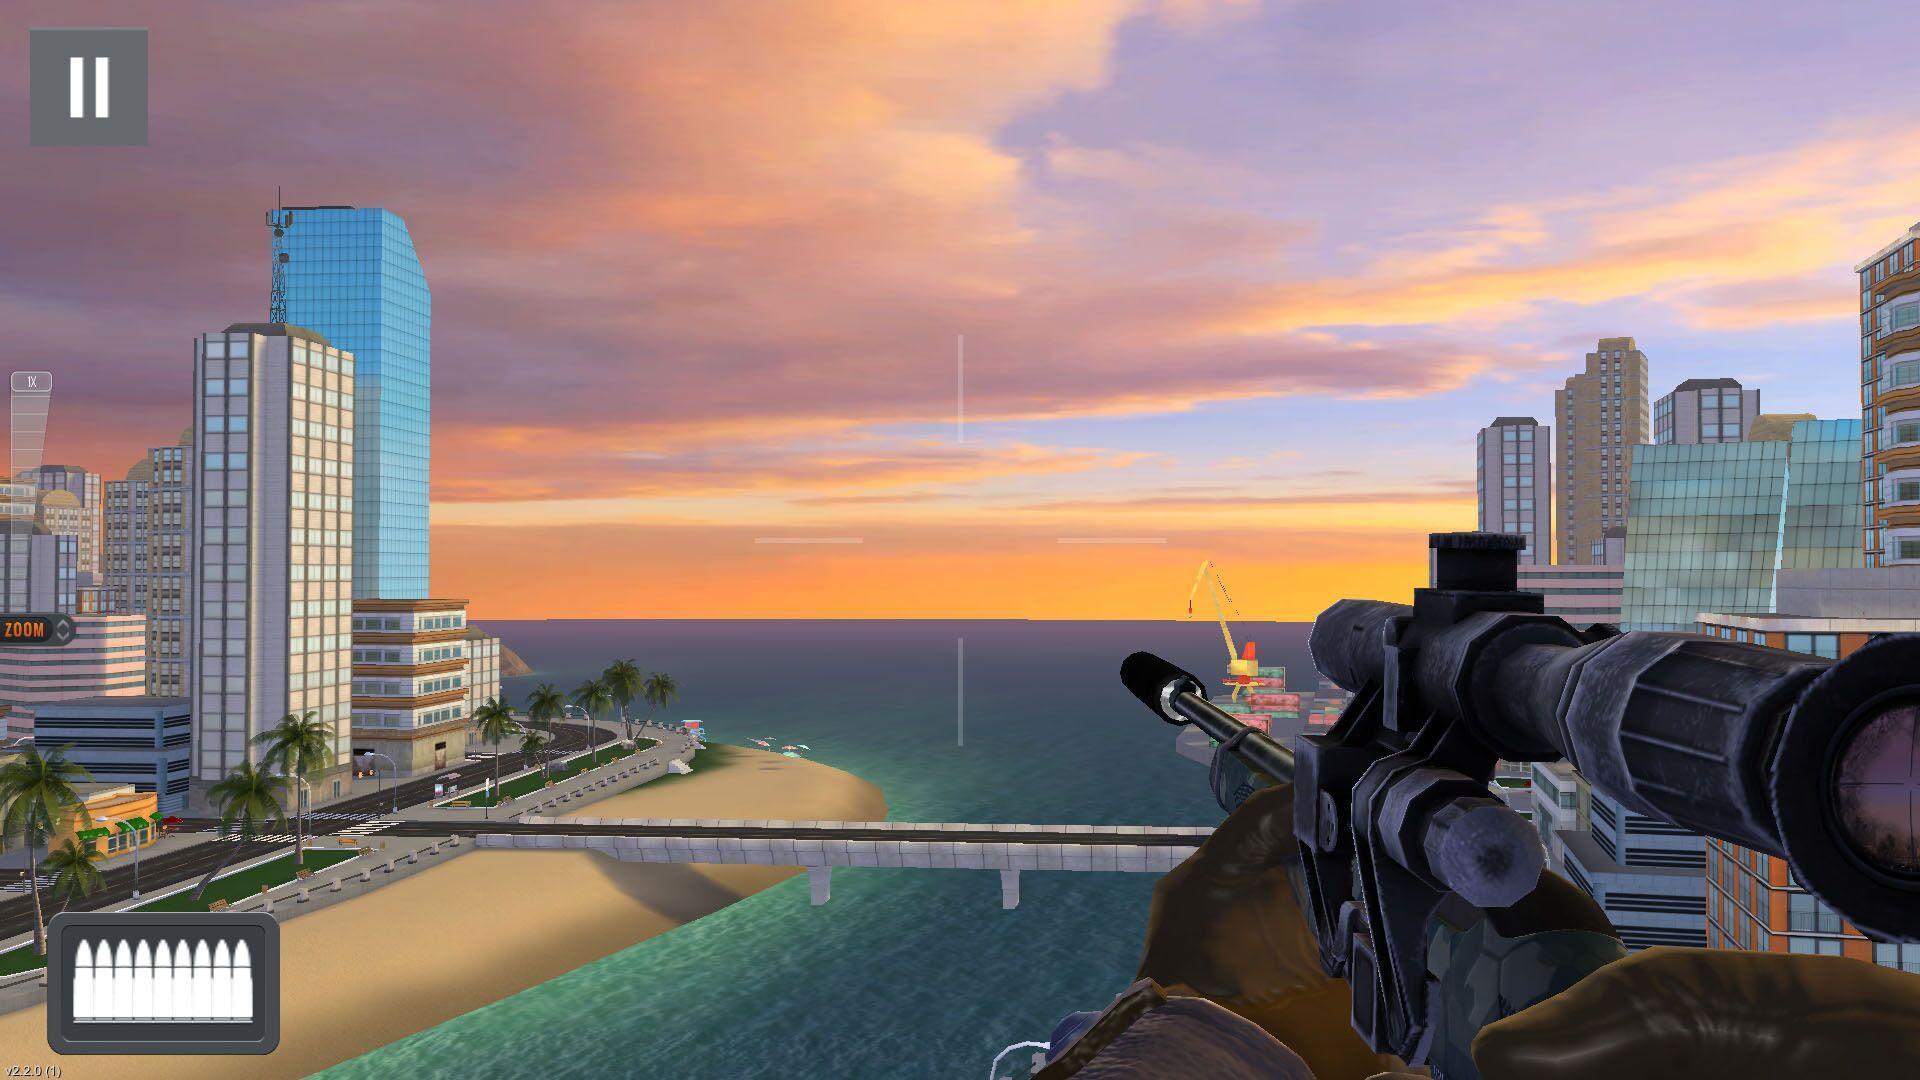 Sniper 3D Fun Free Online FPS Shooting Game 3.15.1 Screenshot 24